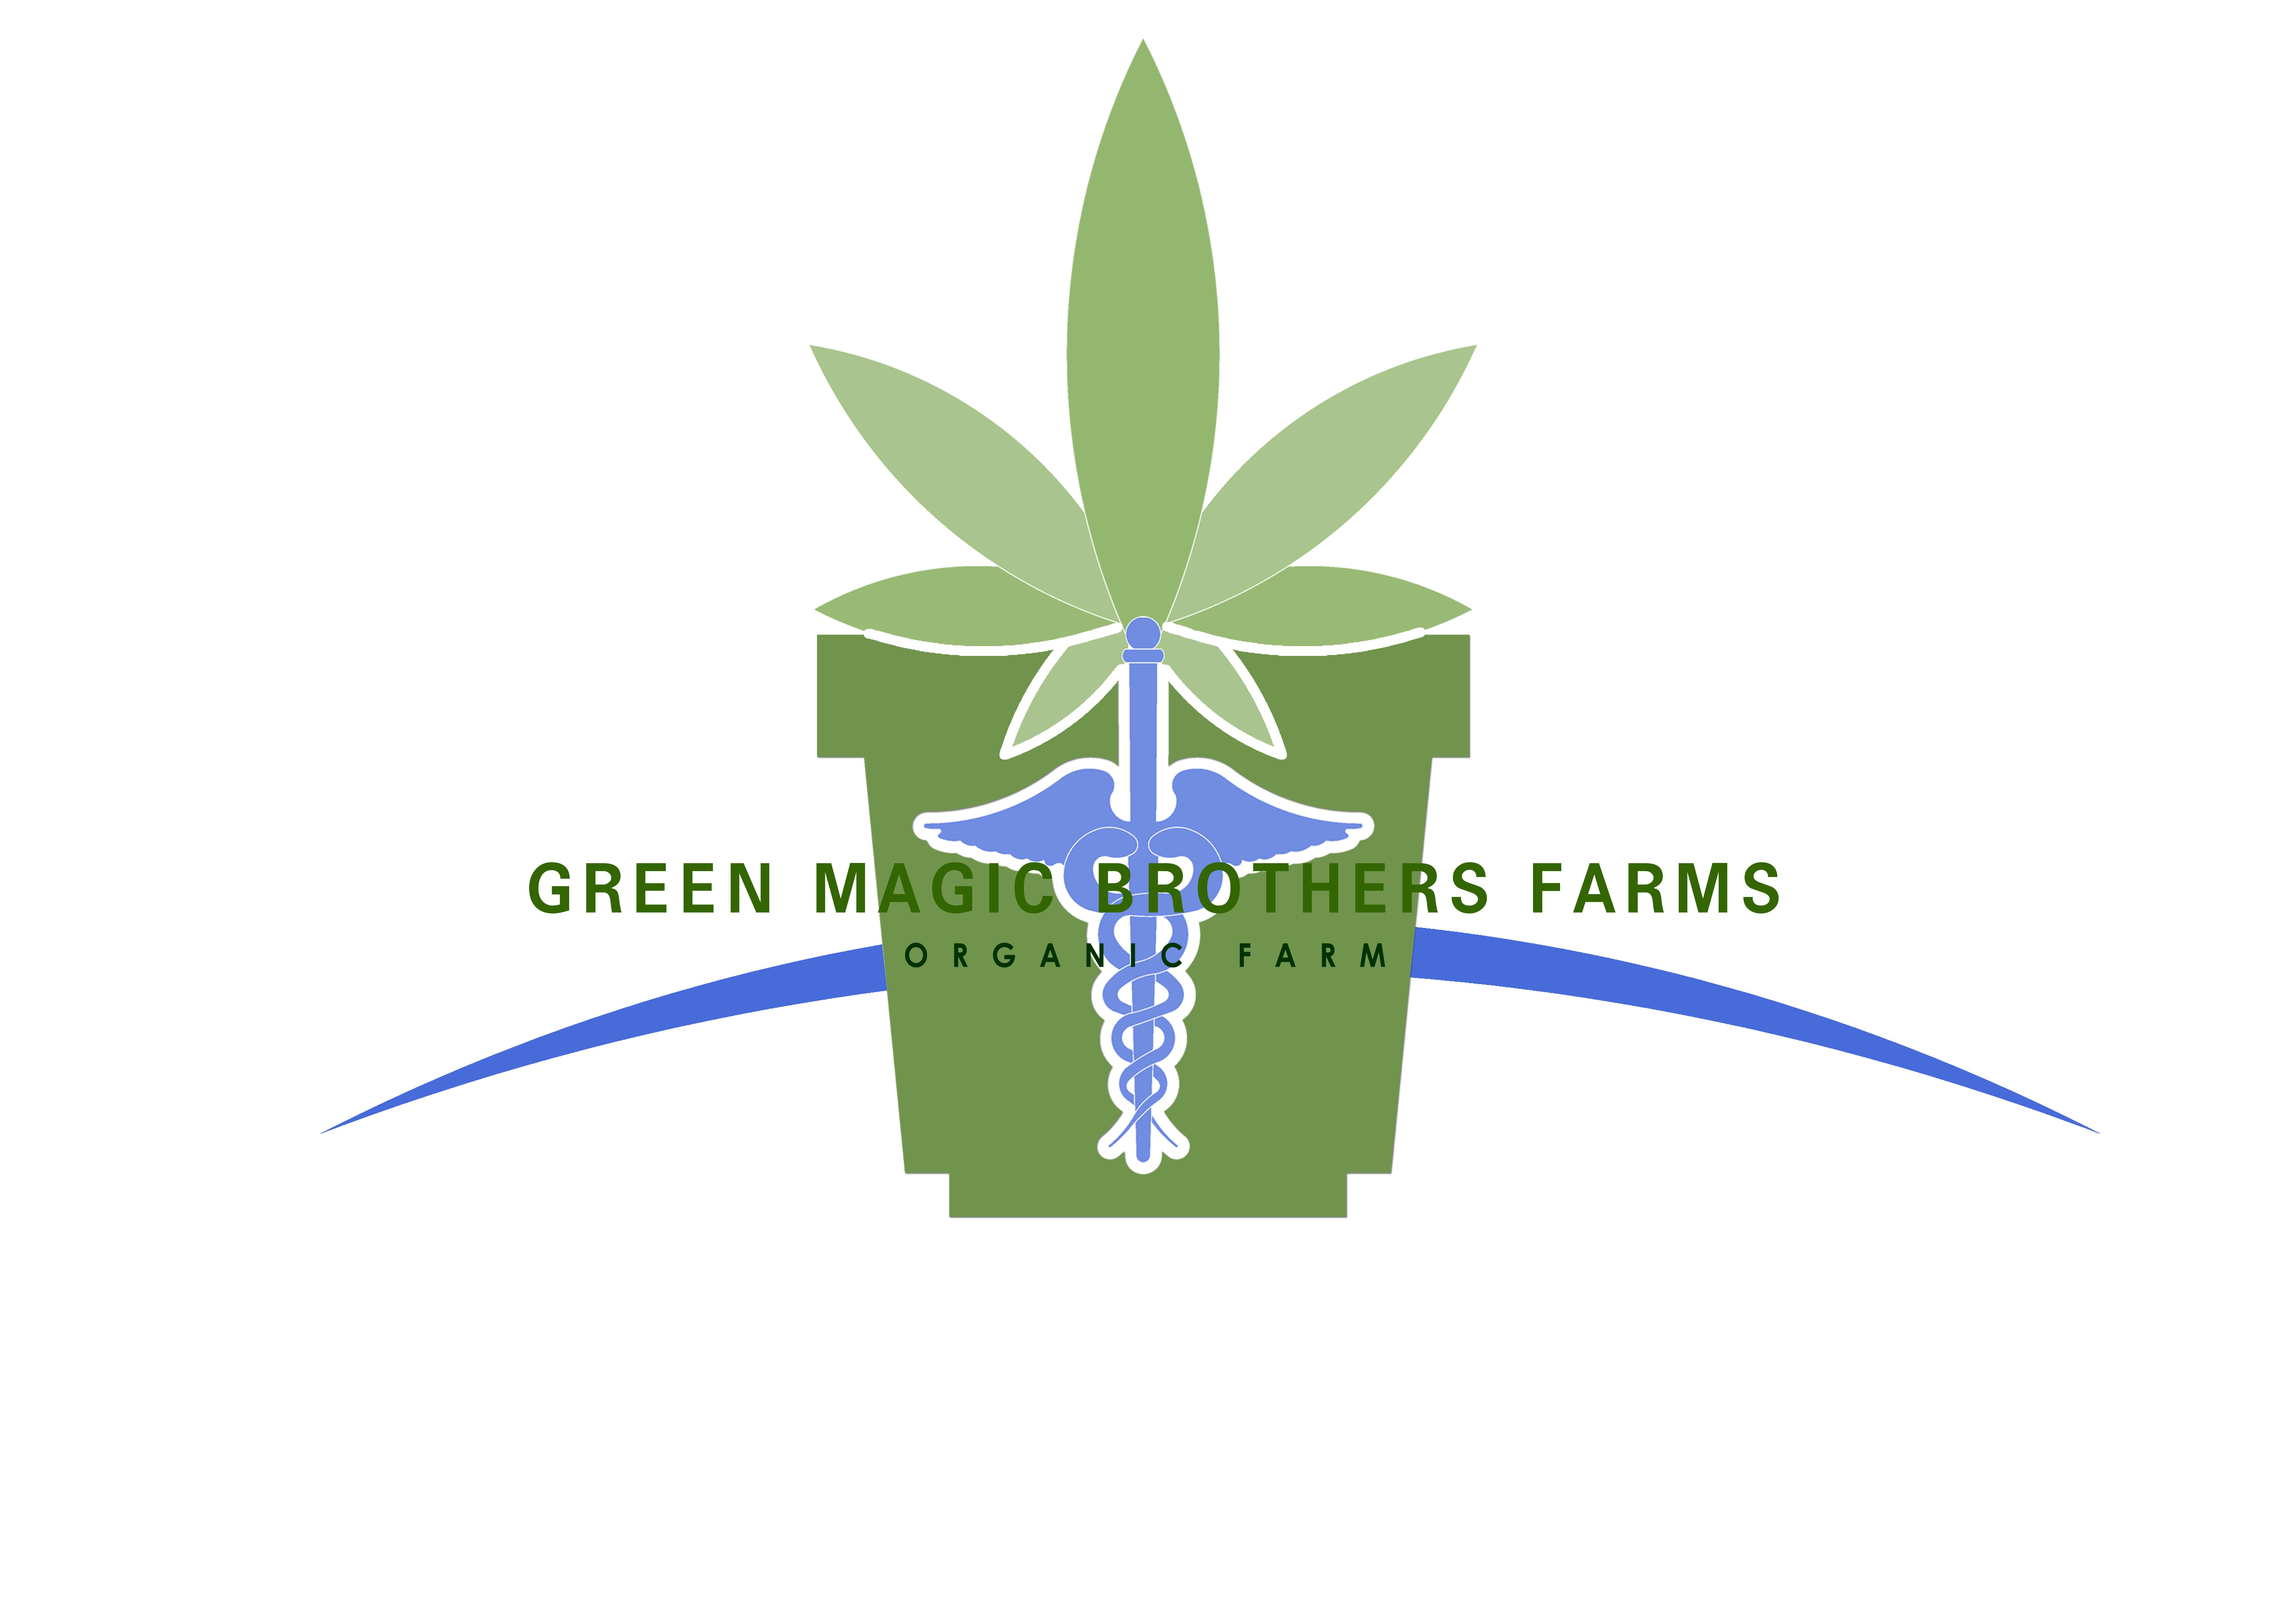 Logo Design by Dn.ArtAndDesign - Entry No. 79 in the Logo Design Contest Green Brothers Farm Logo Design.